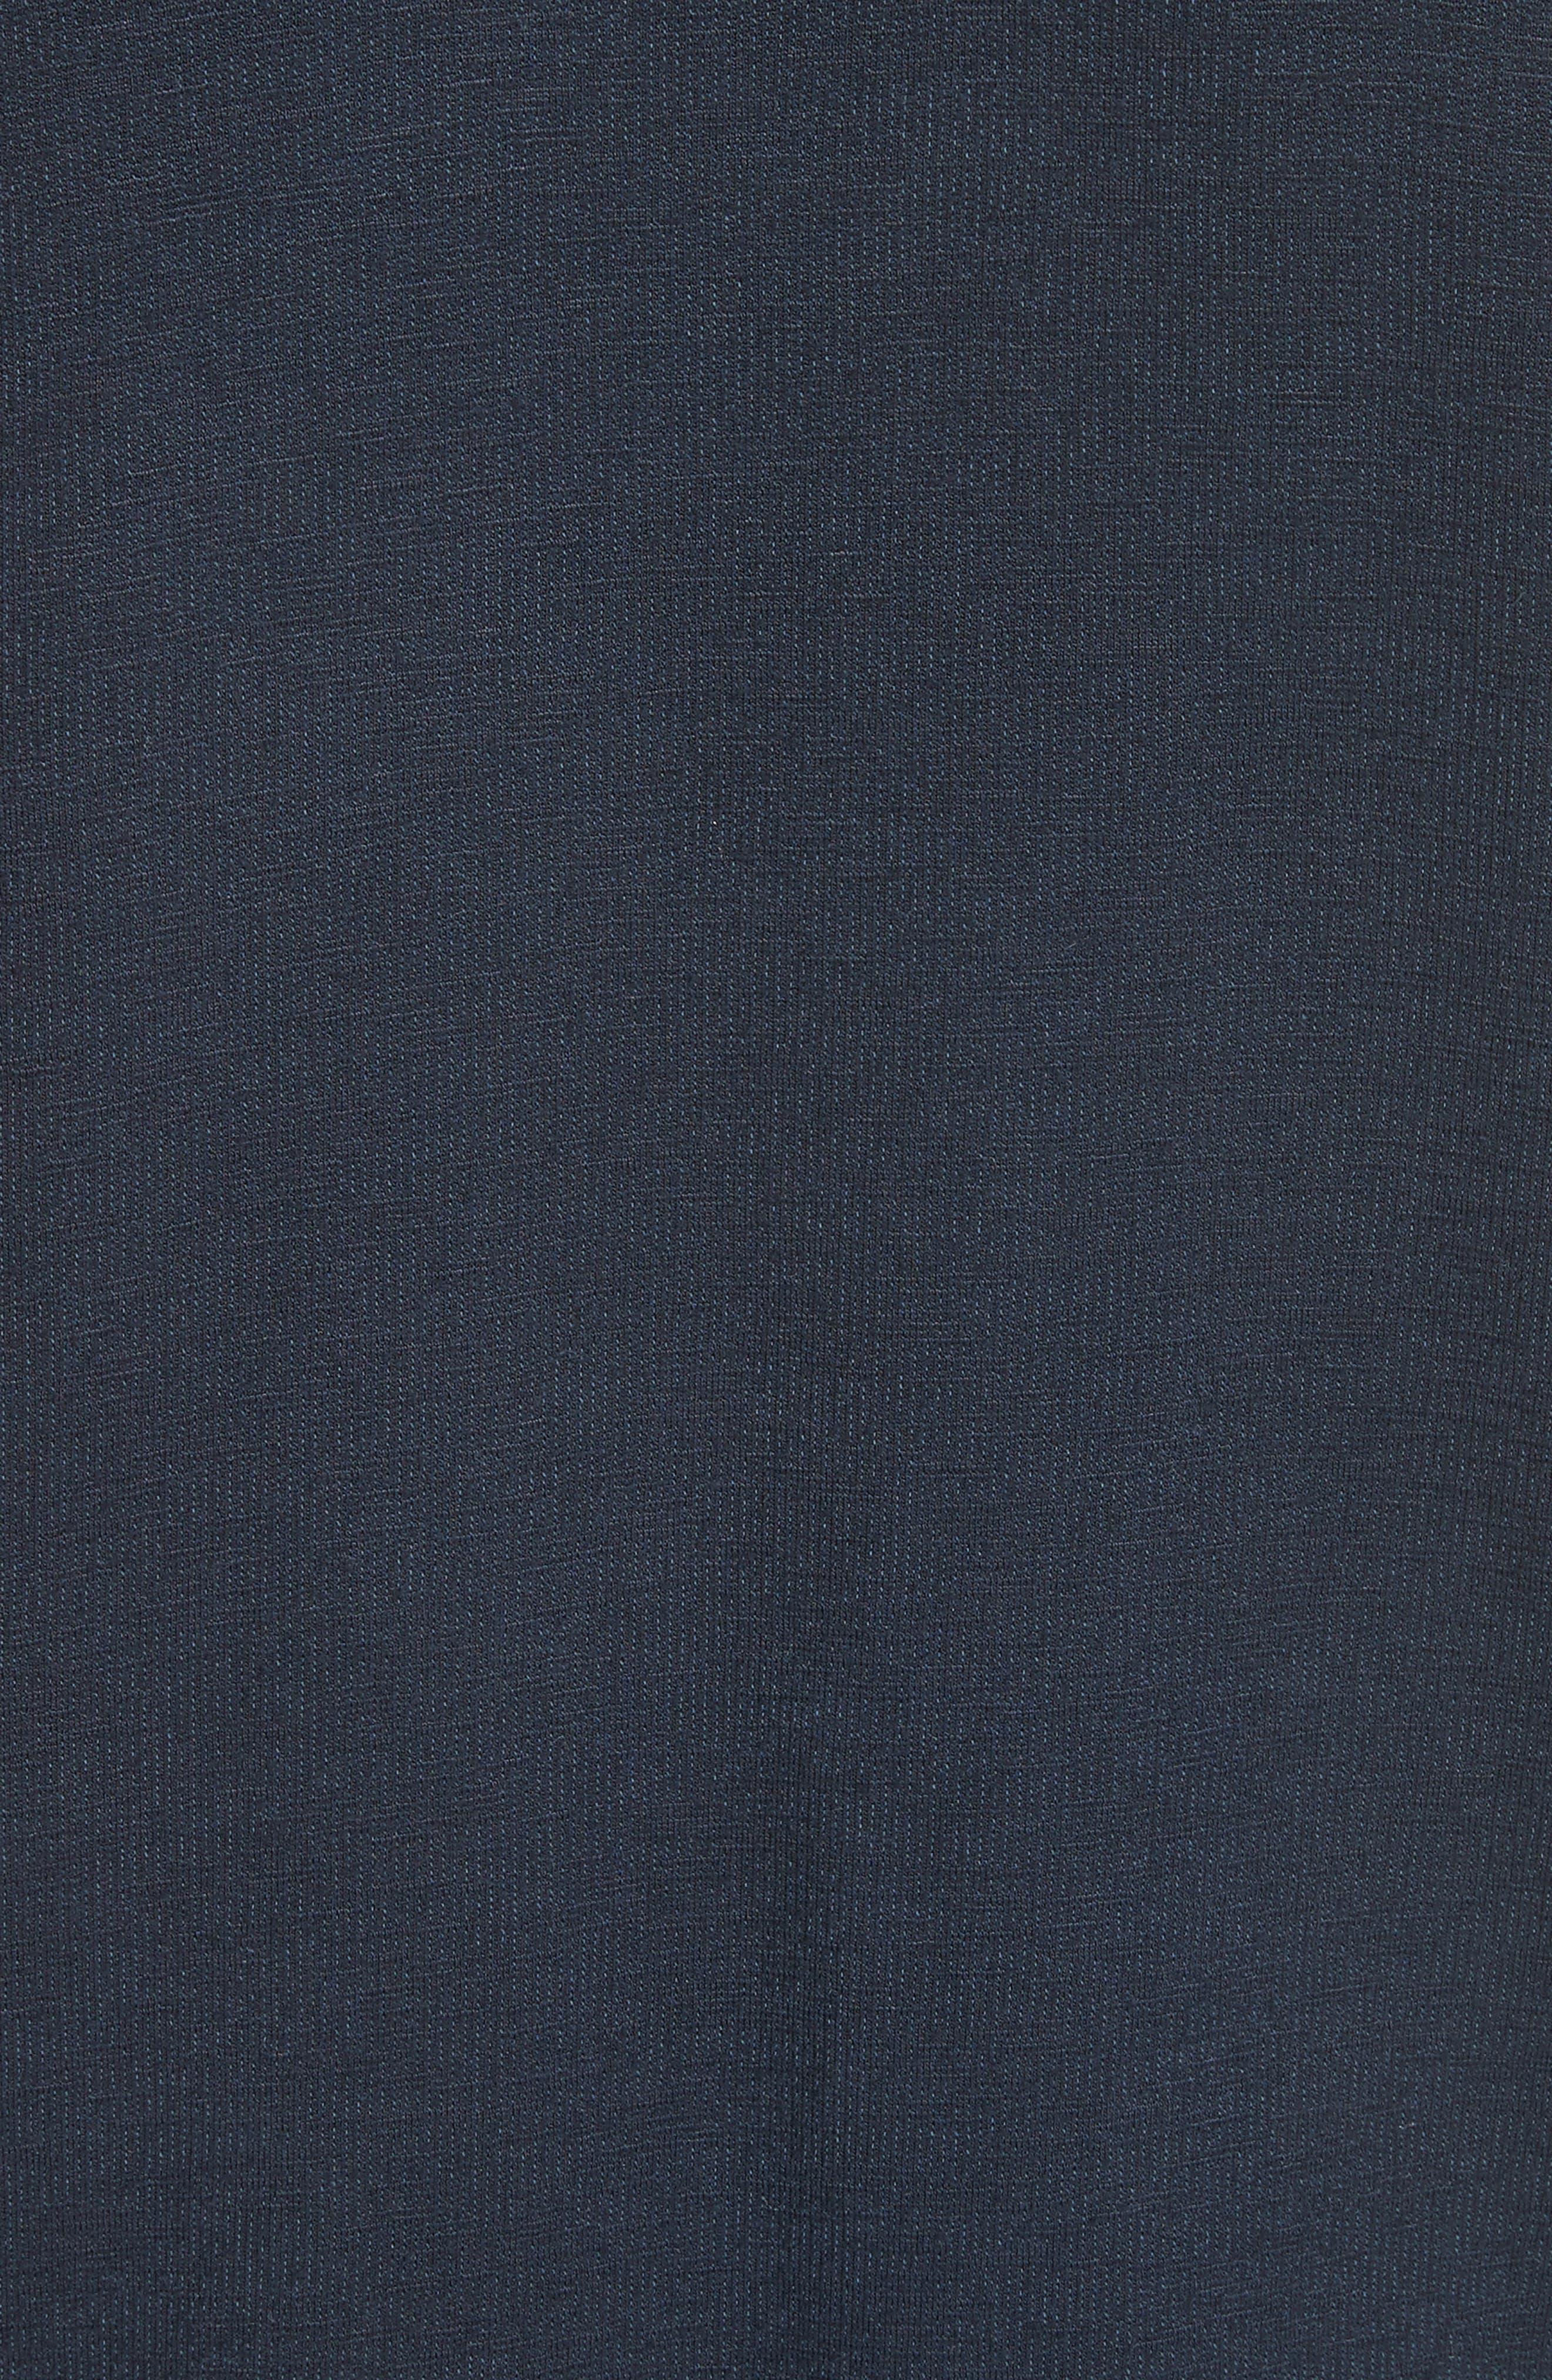 Lace Sleeve Sweatshirt,                             Alternate thumbnail 5, color,                             Navy